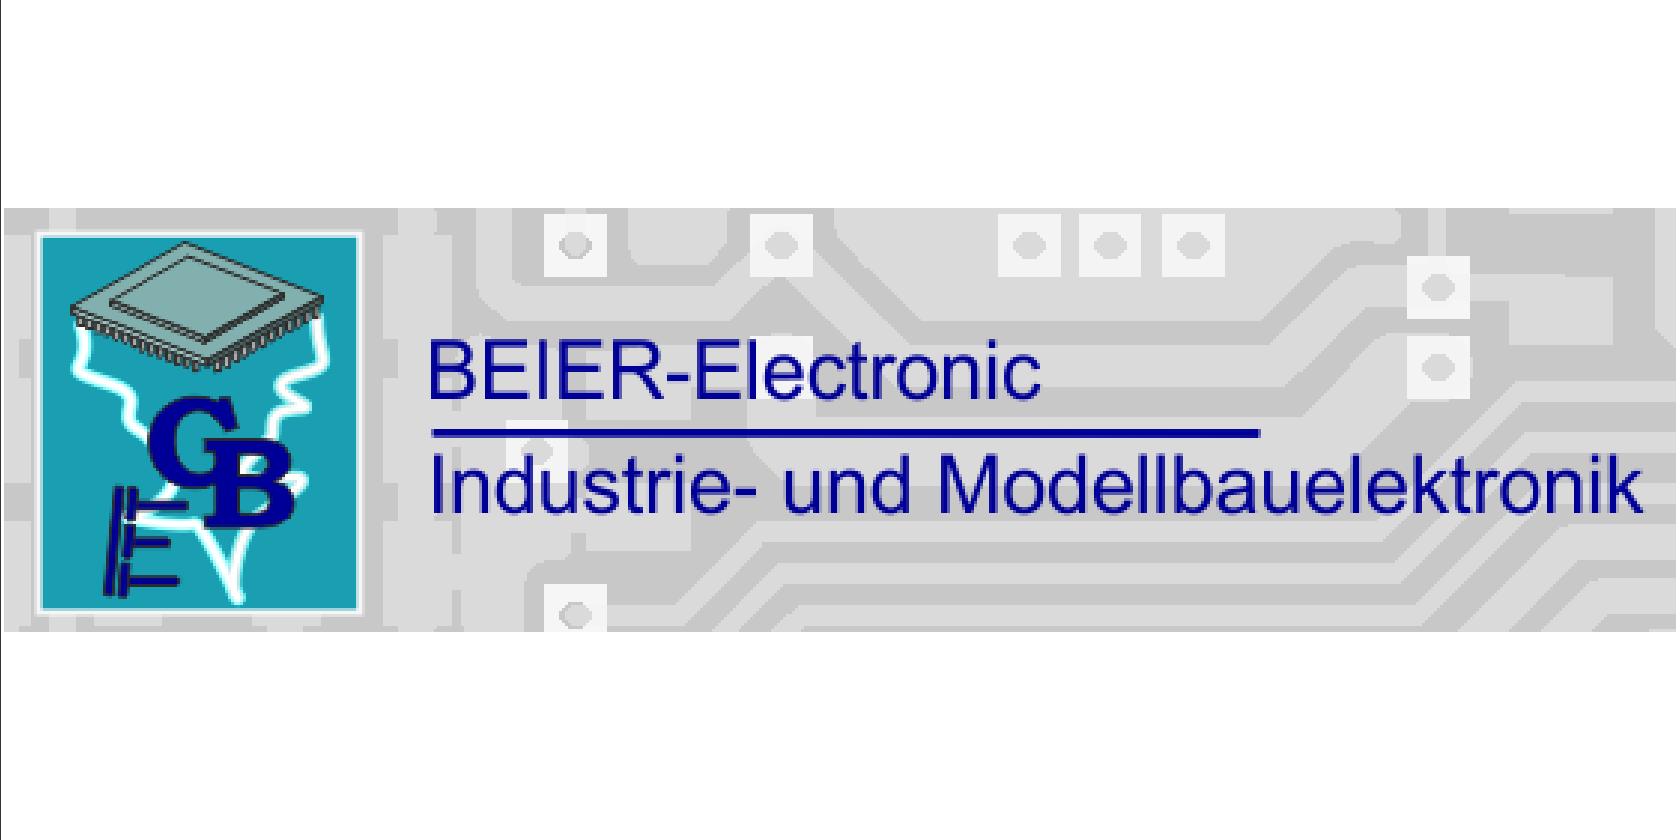 Beier-Electronic